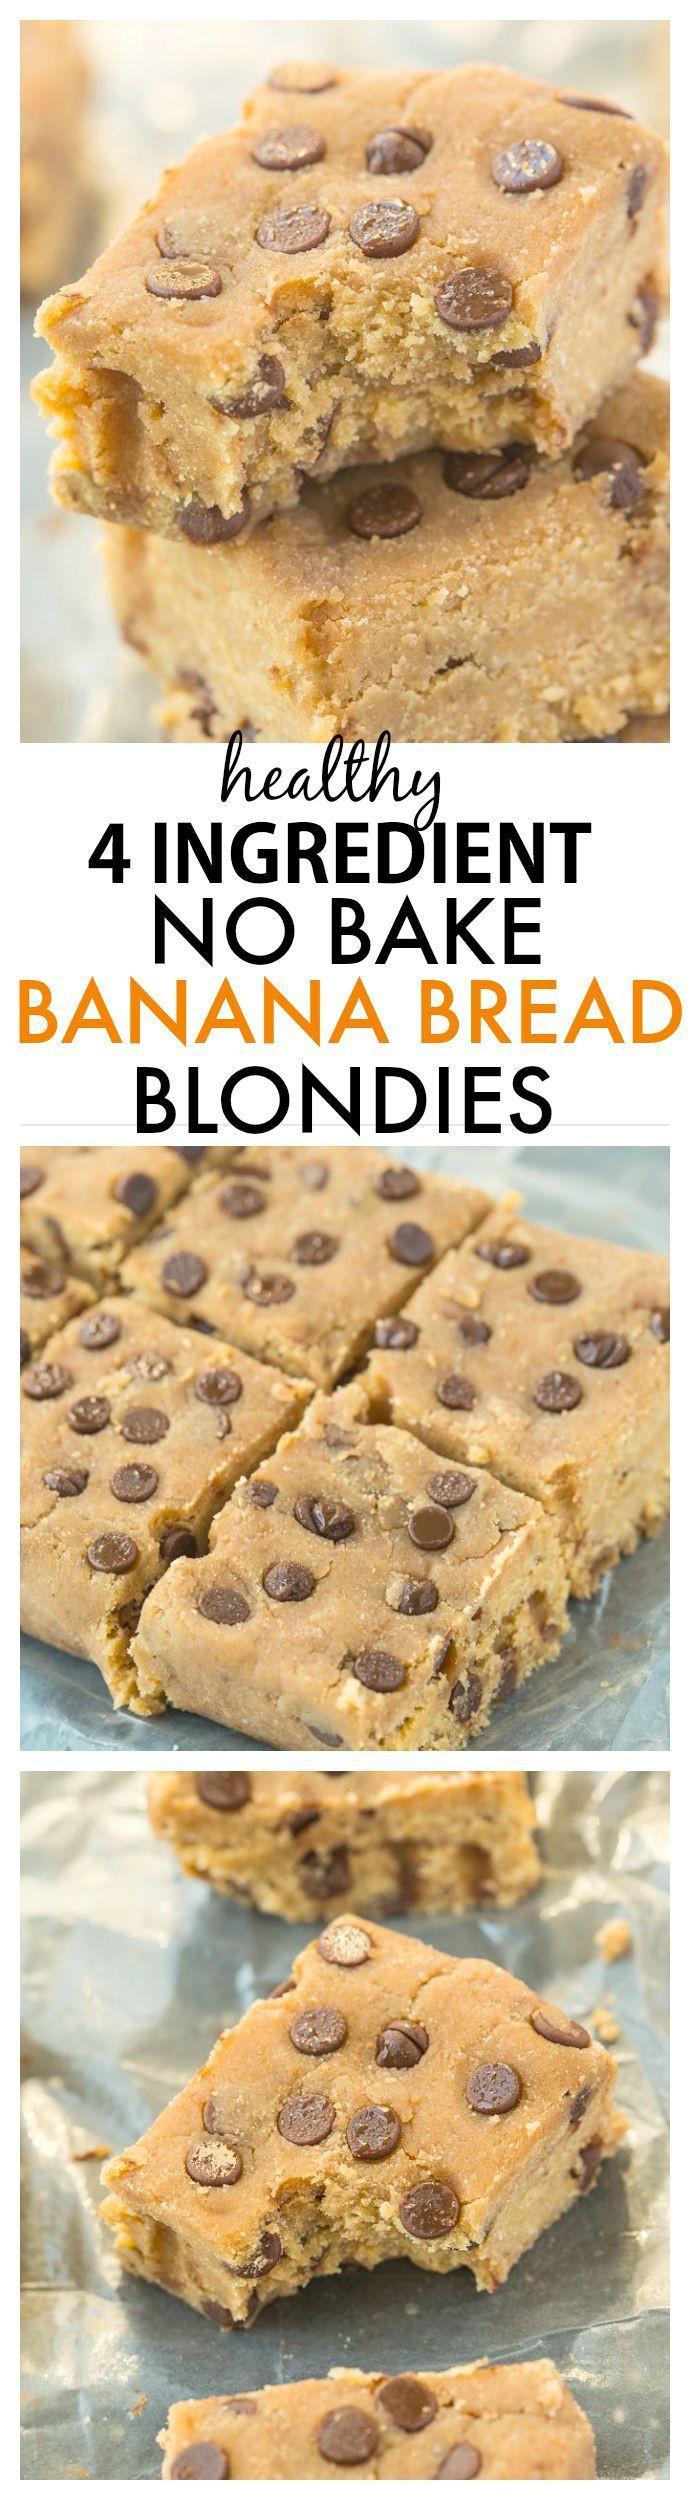 Healthy Bake Bread  Four Ingre nt No Bake Banana Bread Blon s